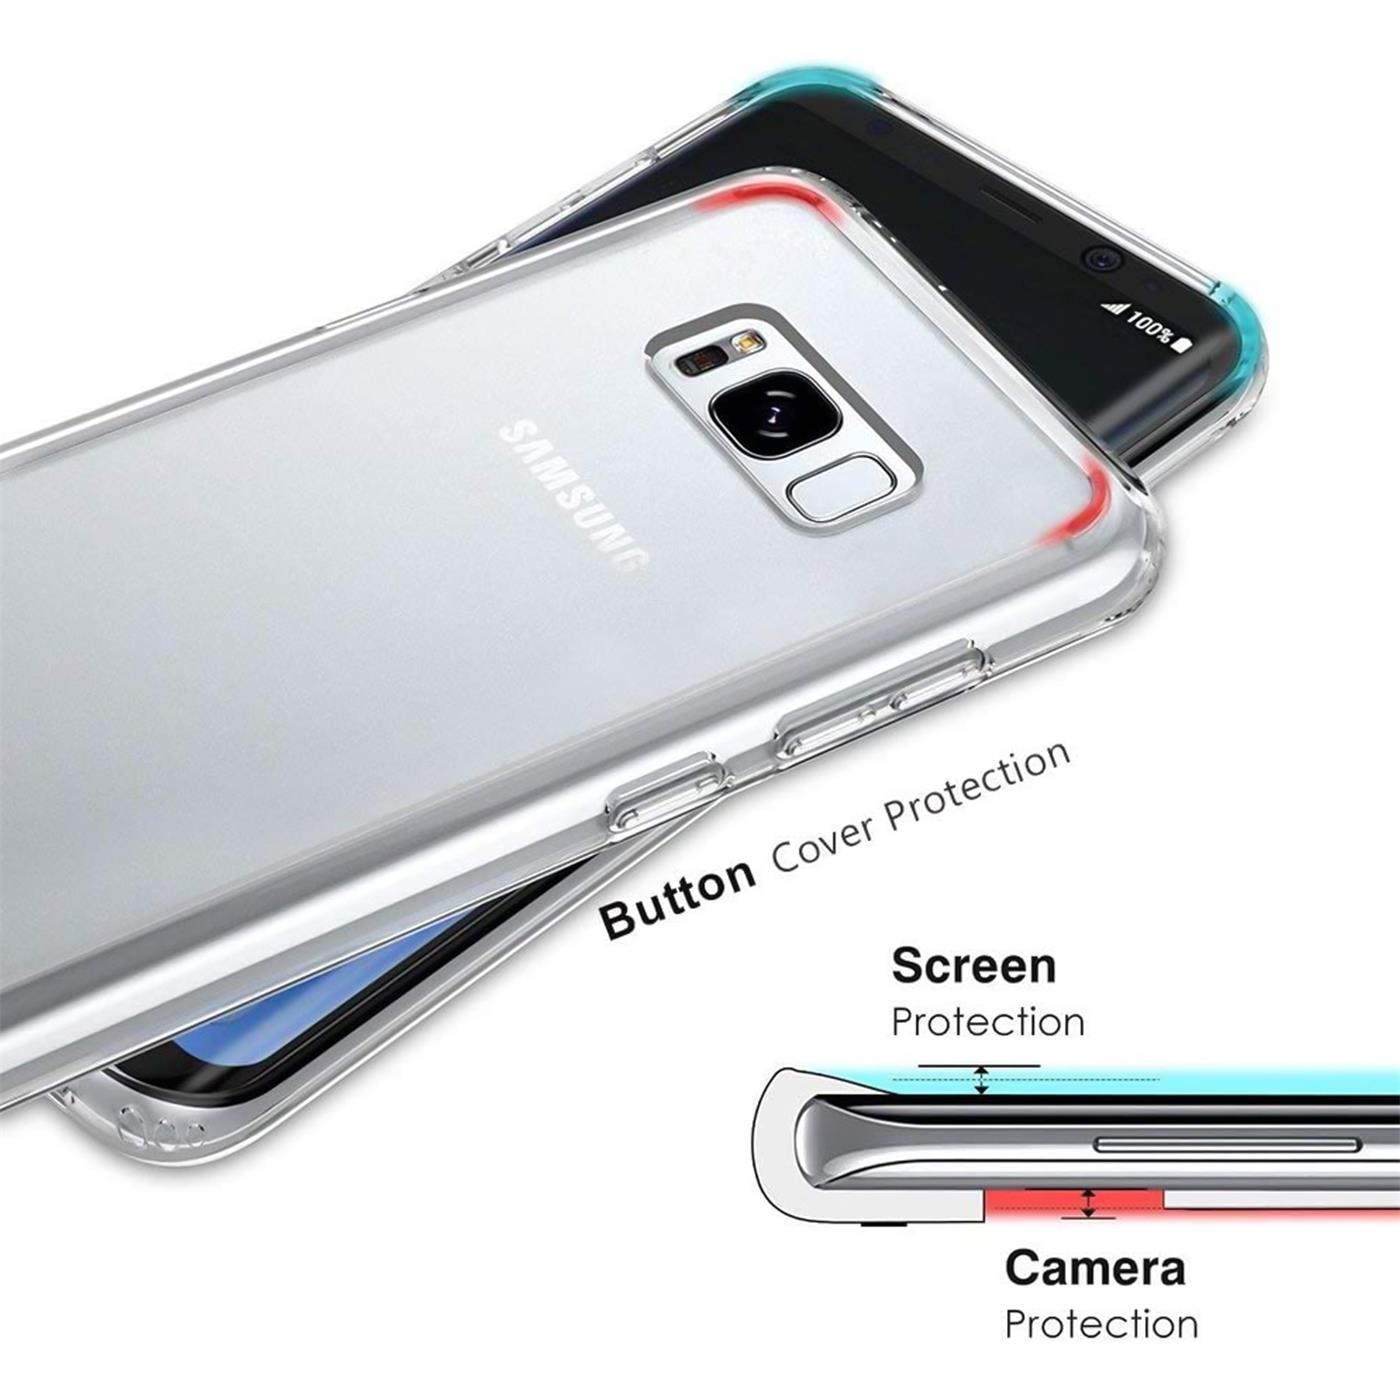 Samsung-Galaxy-s8-Duenn-Silikon-Klar-Case-Cover-Ultra-Slim-Stossfeste-Gel-Rueckseite Indexbild 4